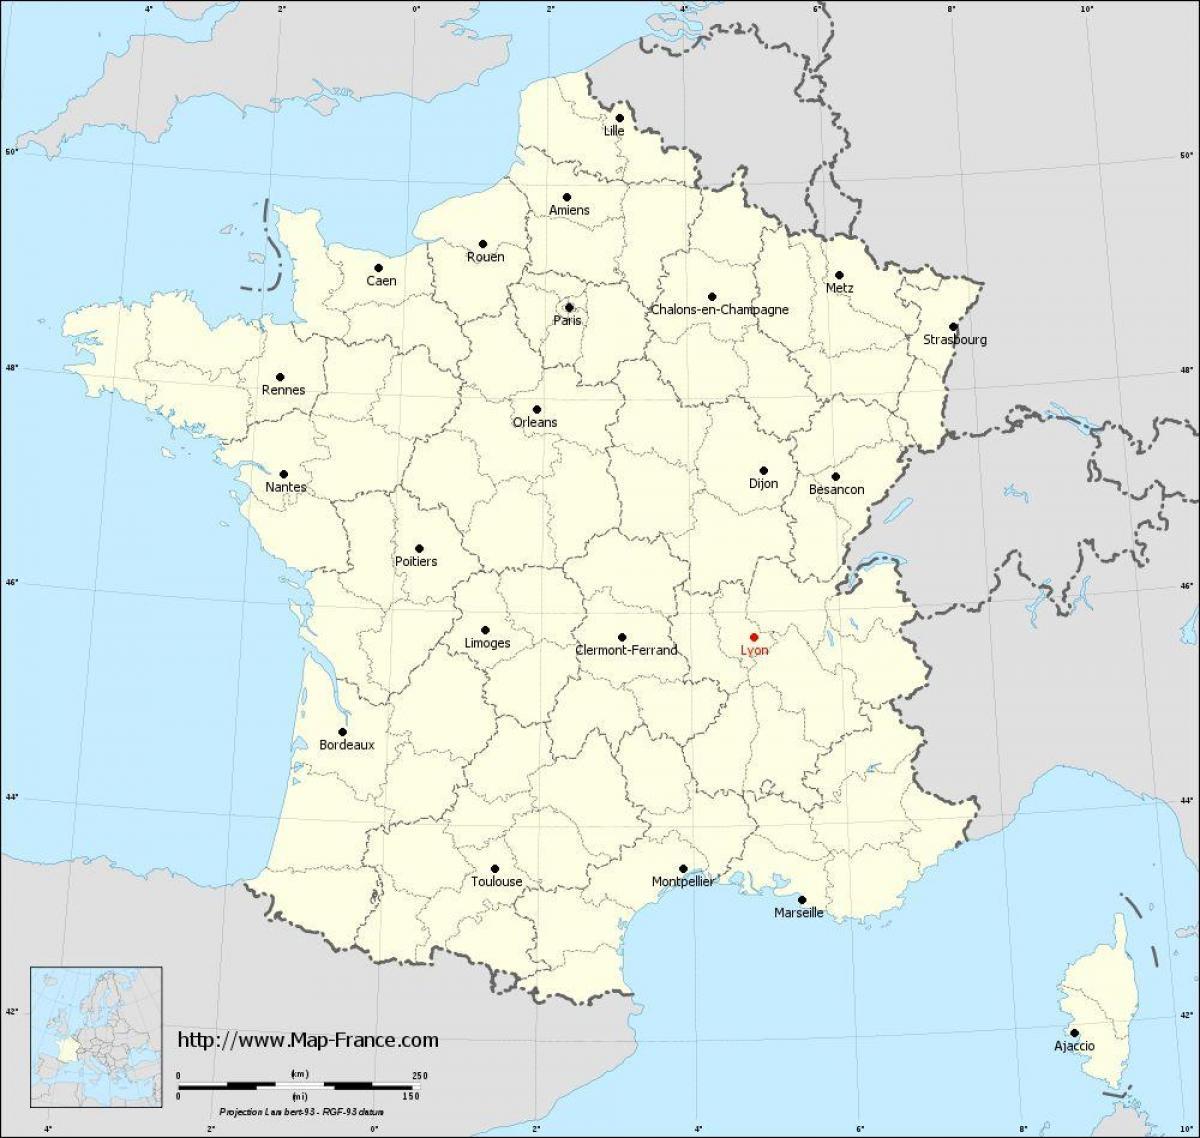 lyon karte Wo ist Lyon in Frankreich anzeigen   Wo ist Lyon in Frankreich in